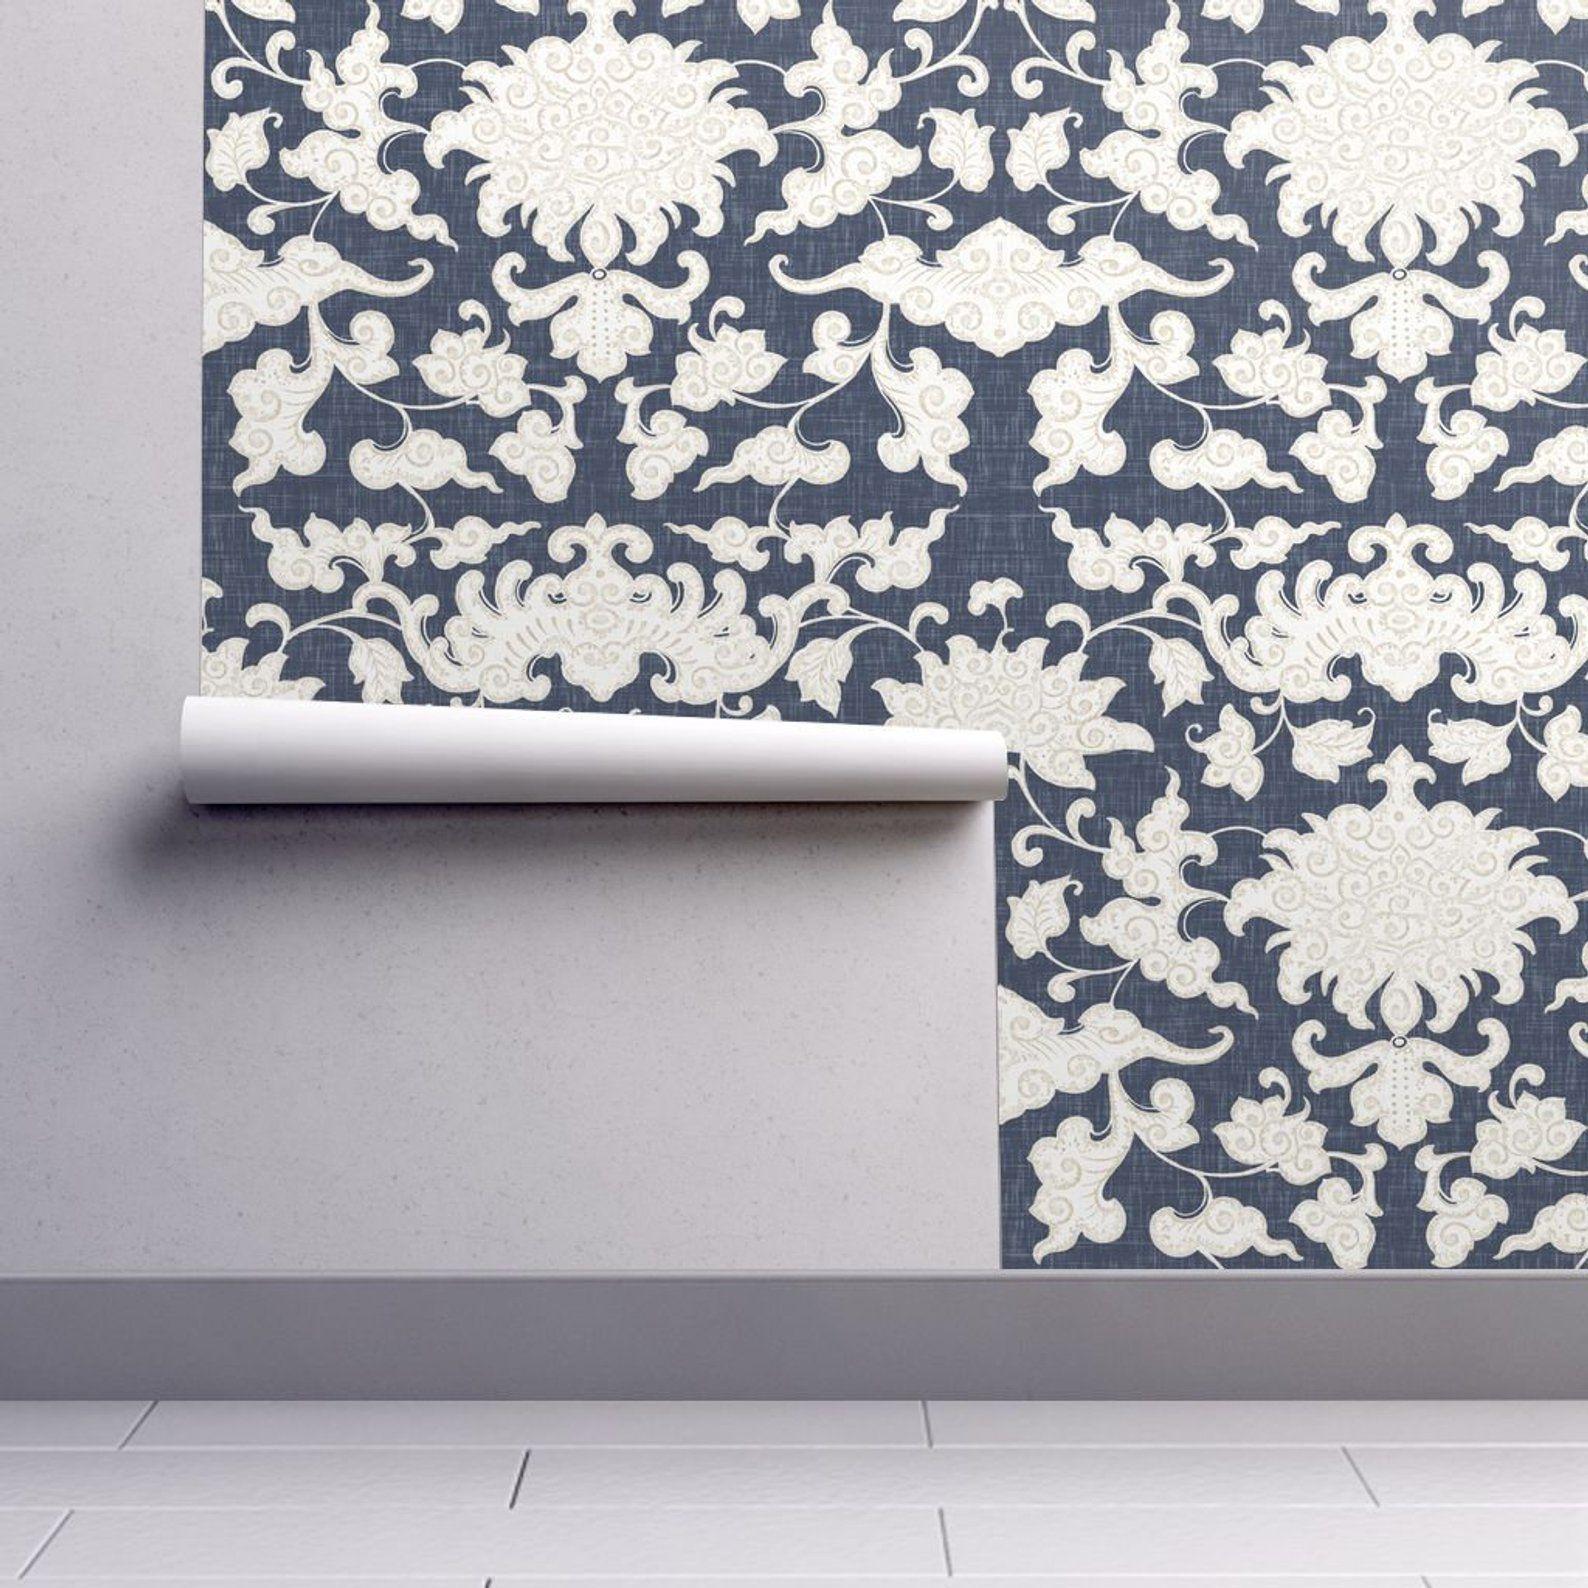 Garden Wallpaper Persia Navy Linen By Willowlanetextiles Etsy Peel And Stick Wallpaper Wallpaper Roll Spoonflower Wallpaper